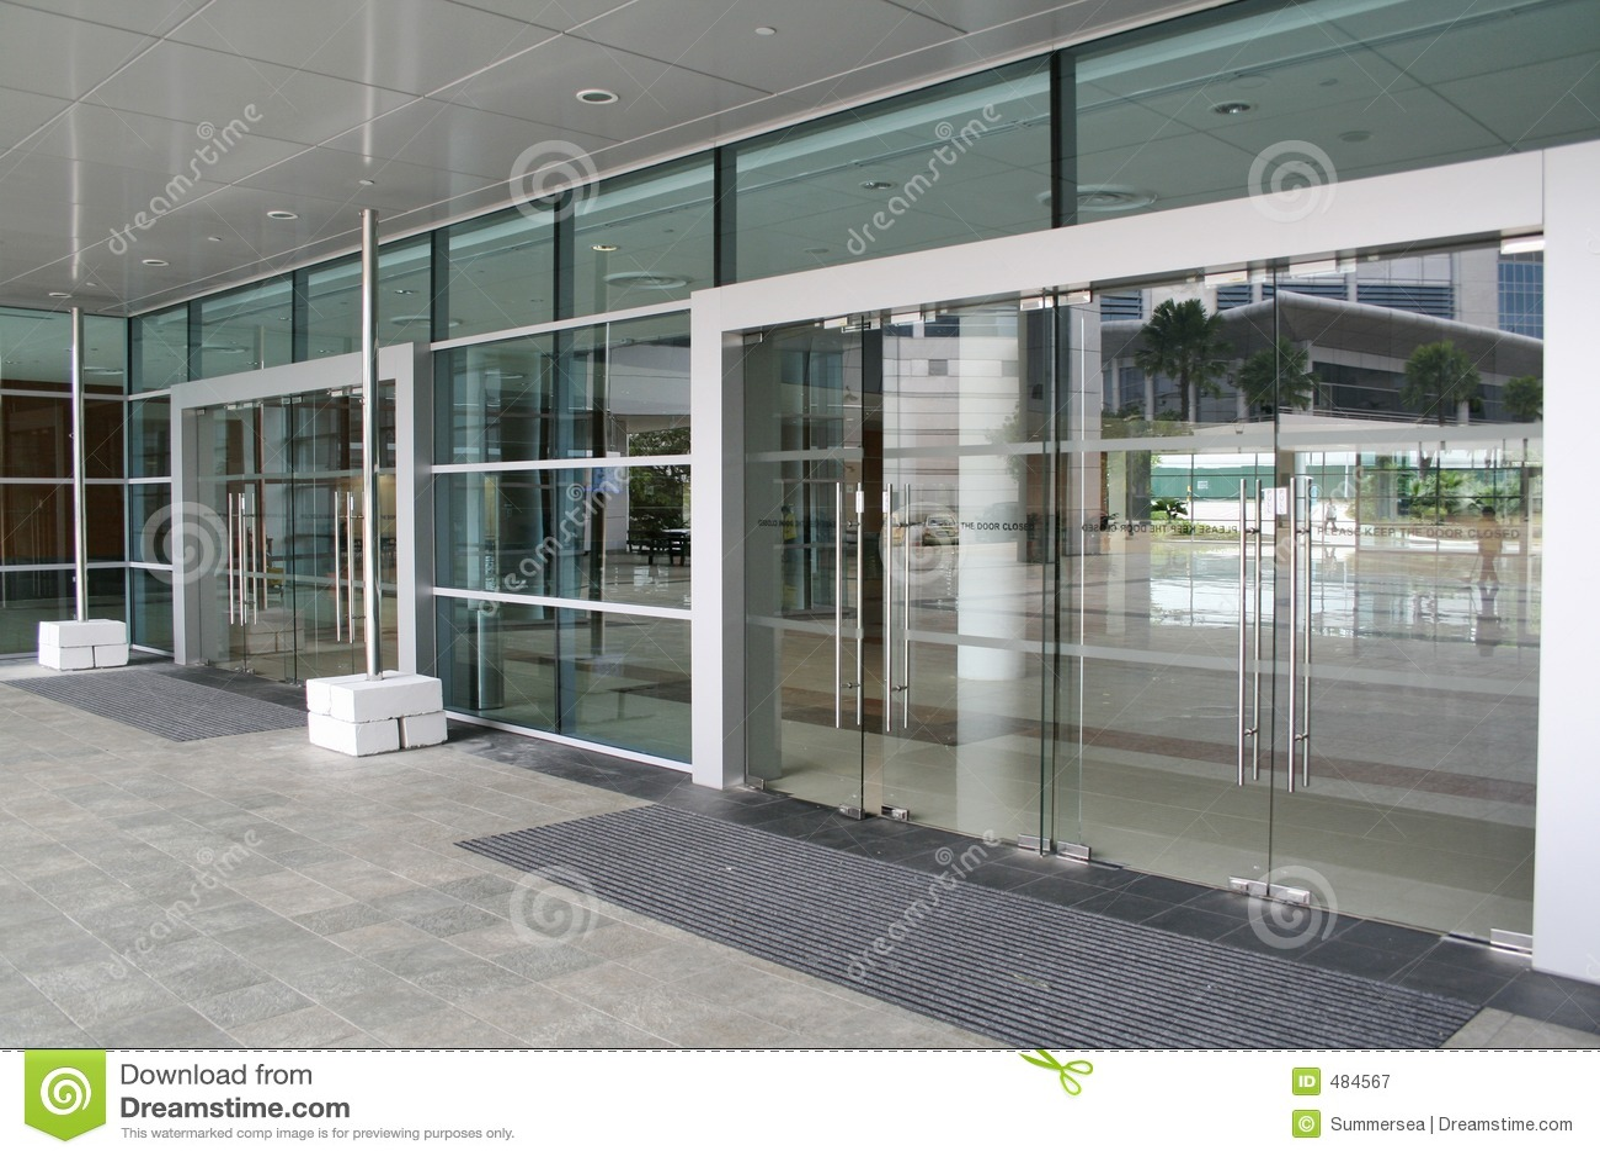 Glass Doors Stock Image Image Of Exit Metal Building